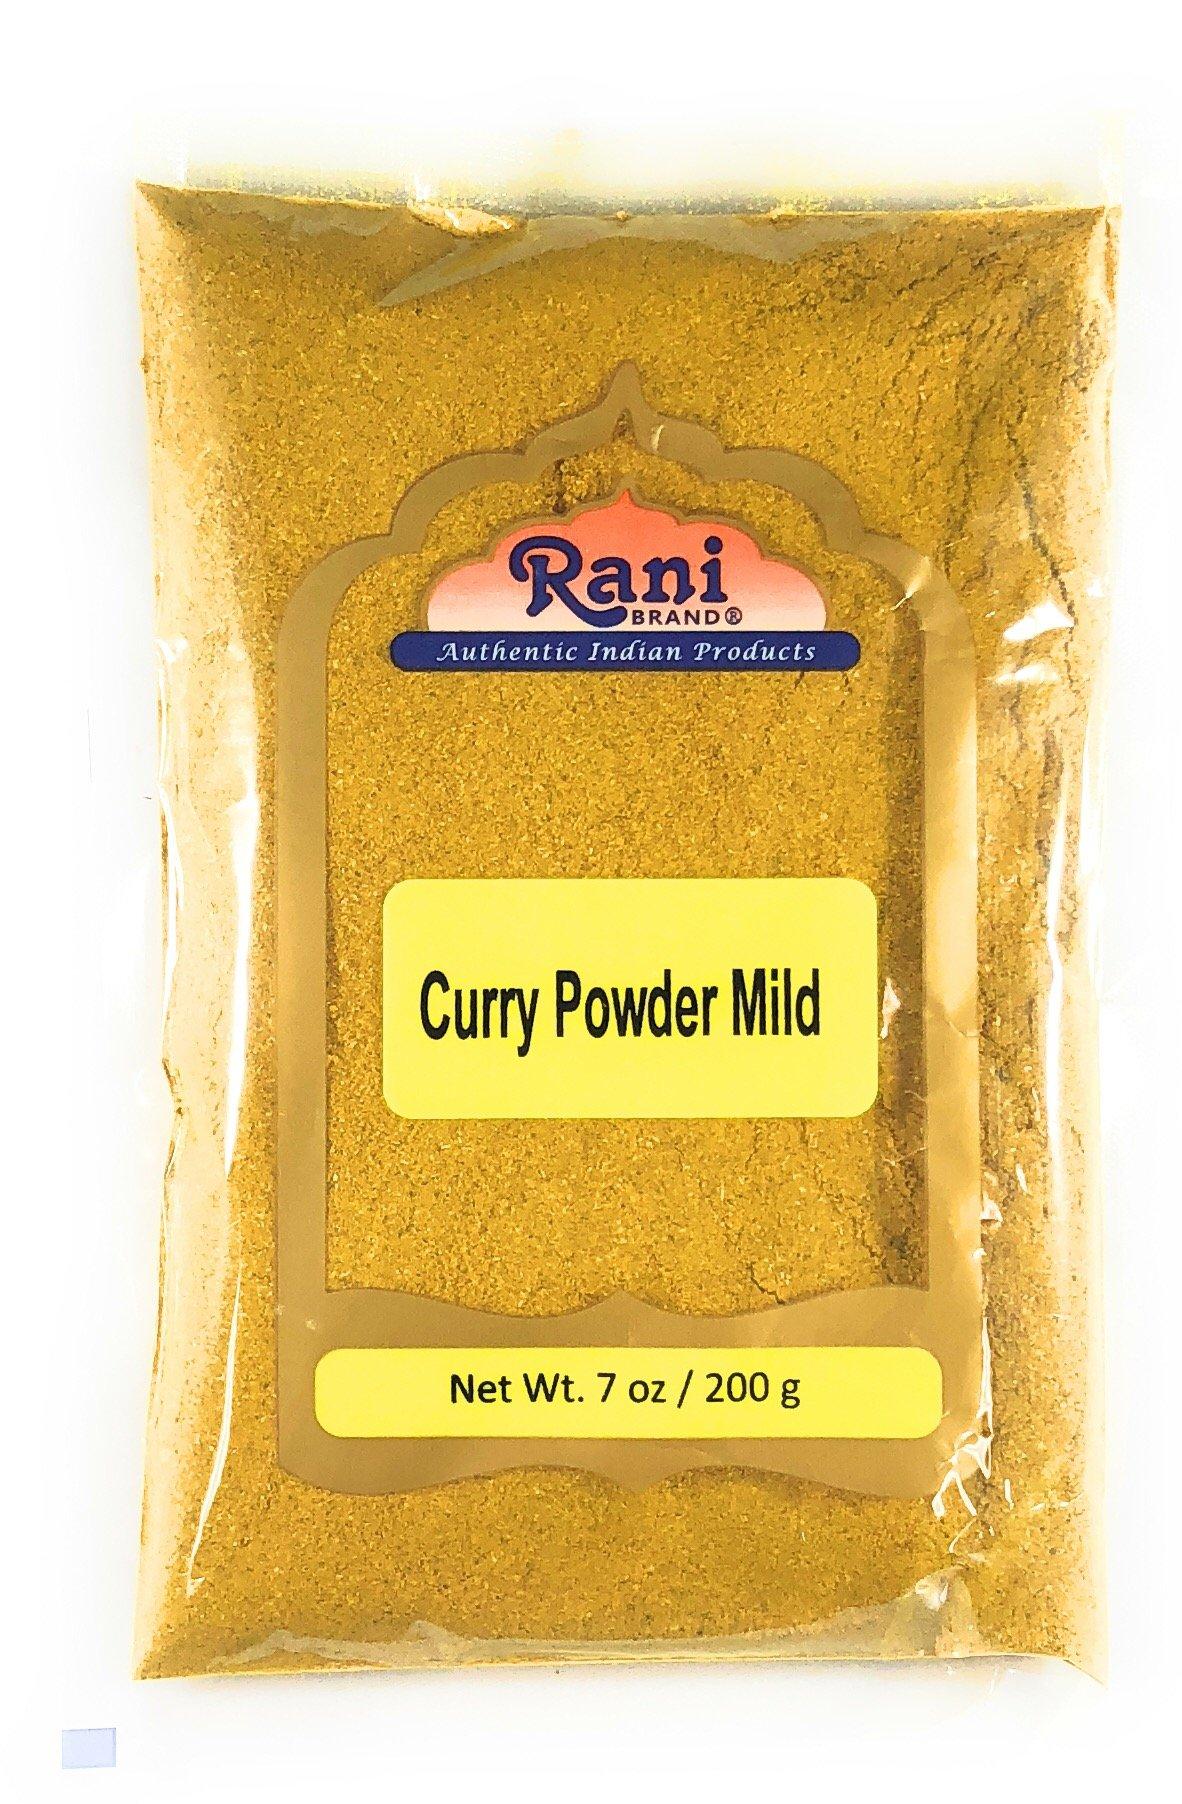 Rani Curry Powder Mild Natural 10-Spice Blend 200g (7oz) ~ Salt Free | Vegan | Gluten Free Ingredients | NON-GMO